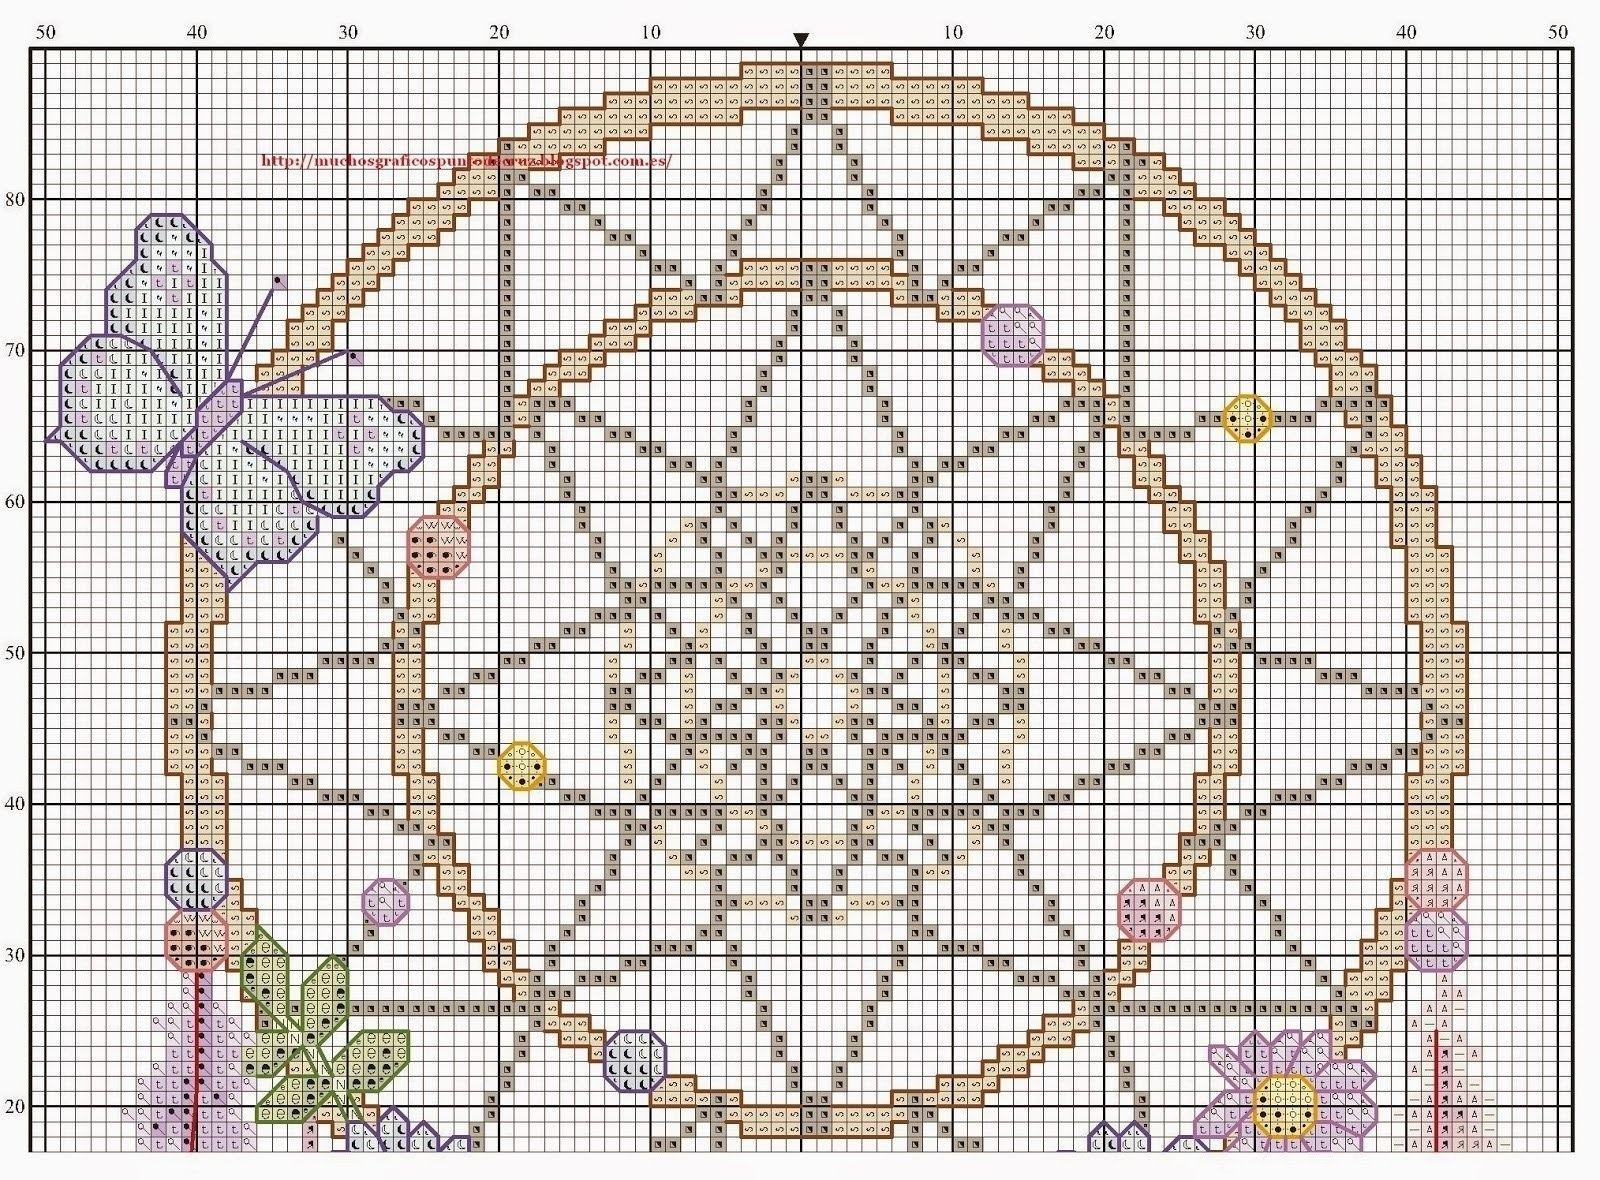 Pin by Lisa McWilliams on Dreamcatchers | Pinterest | Cross Stitch ...